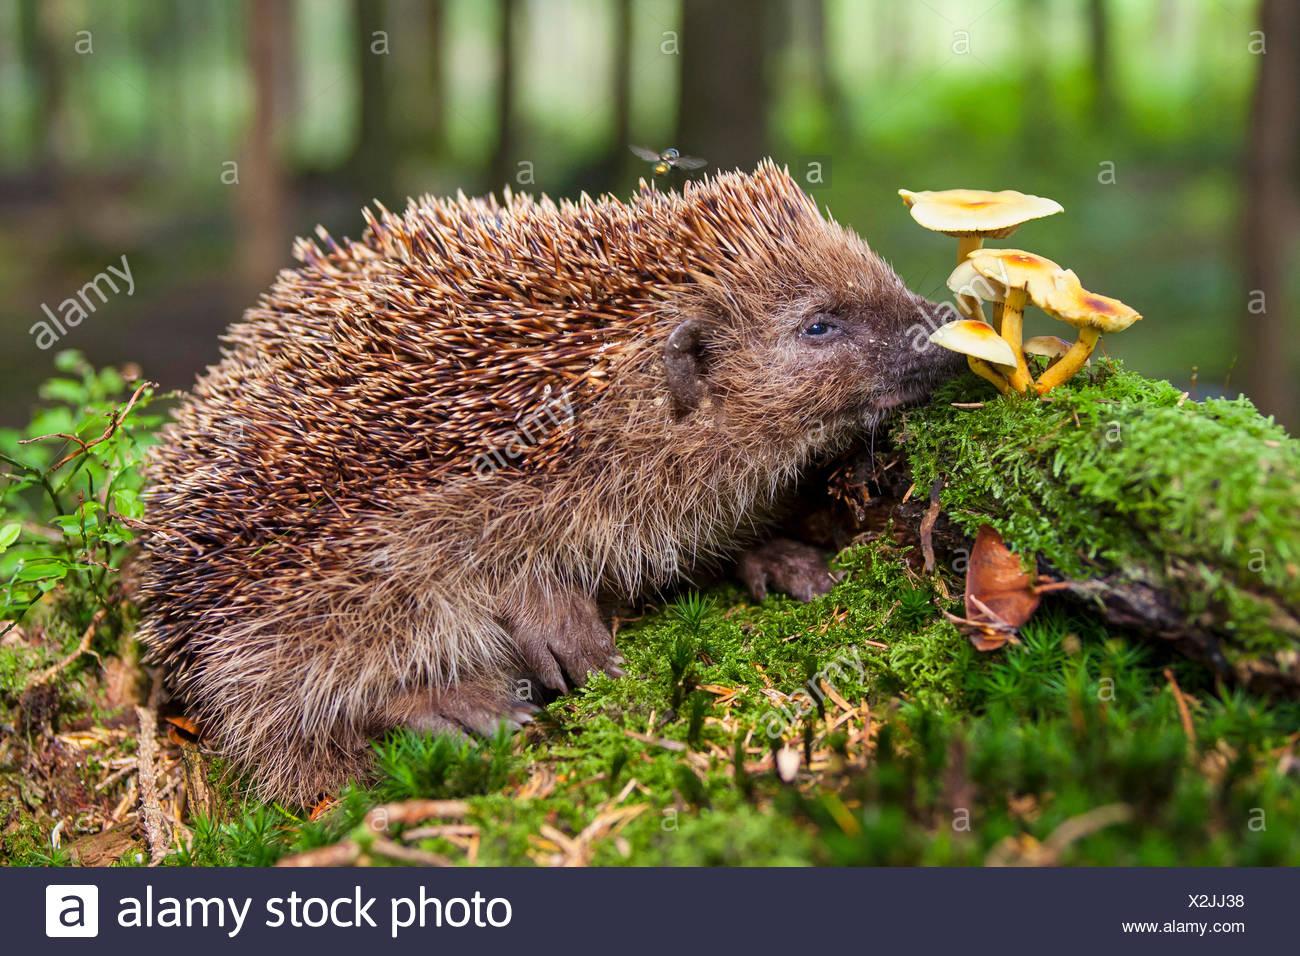 Western hedgehog, European hedgehog (Erinaceus europaeus), hedgehog searching food on the forest, Switzerland, Sankt Gallen Stock Photo